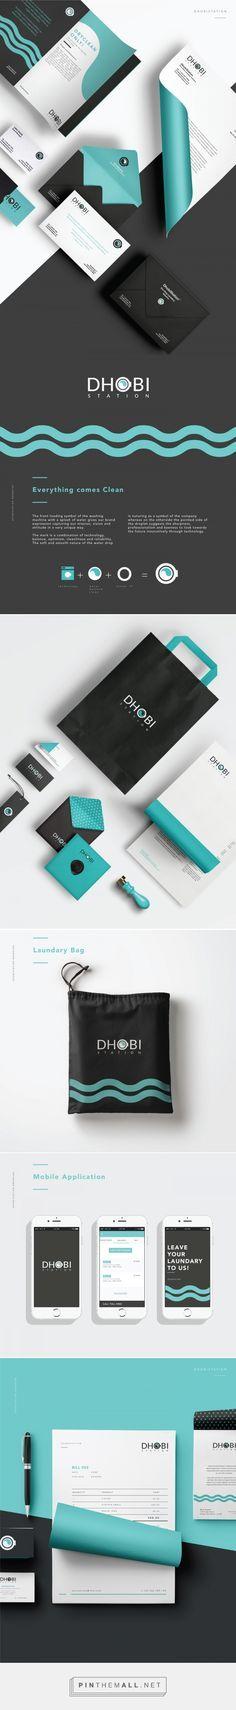 Dhobistation One Stop Laundry Solution Branding by Meroo Seth | Fivestar Branding – Design and Branding Agency & Inspiration Gallery